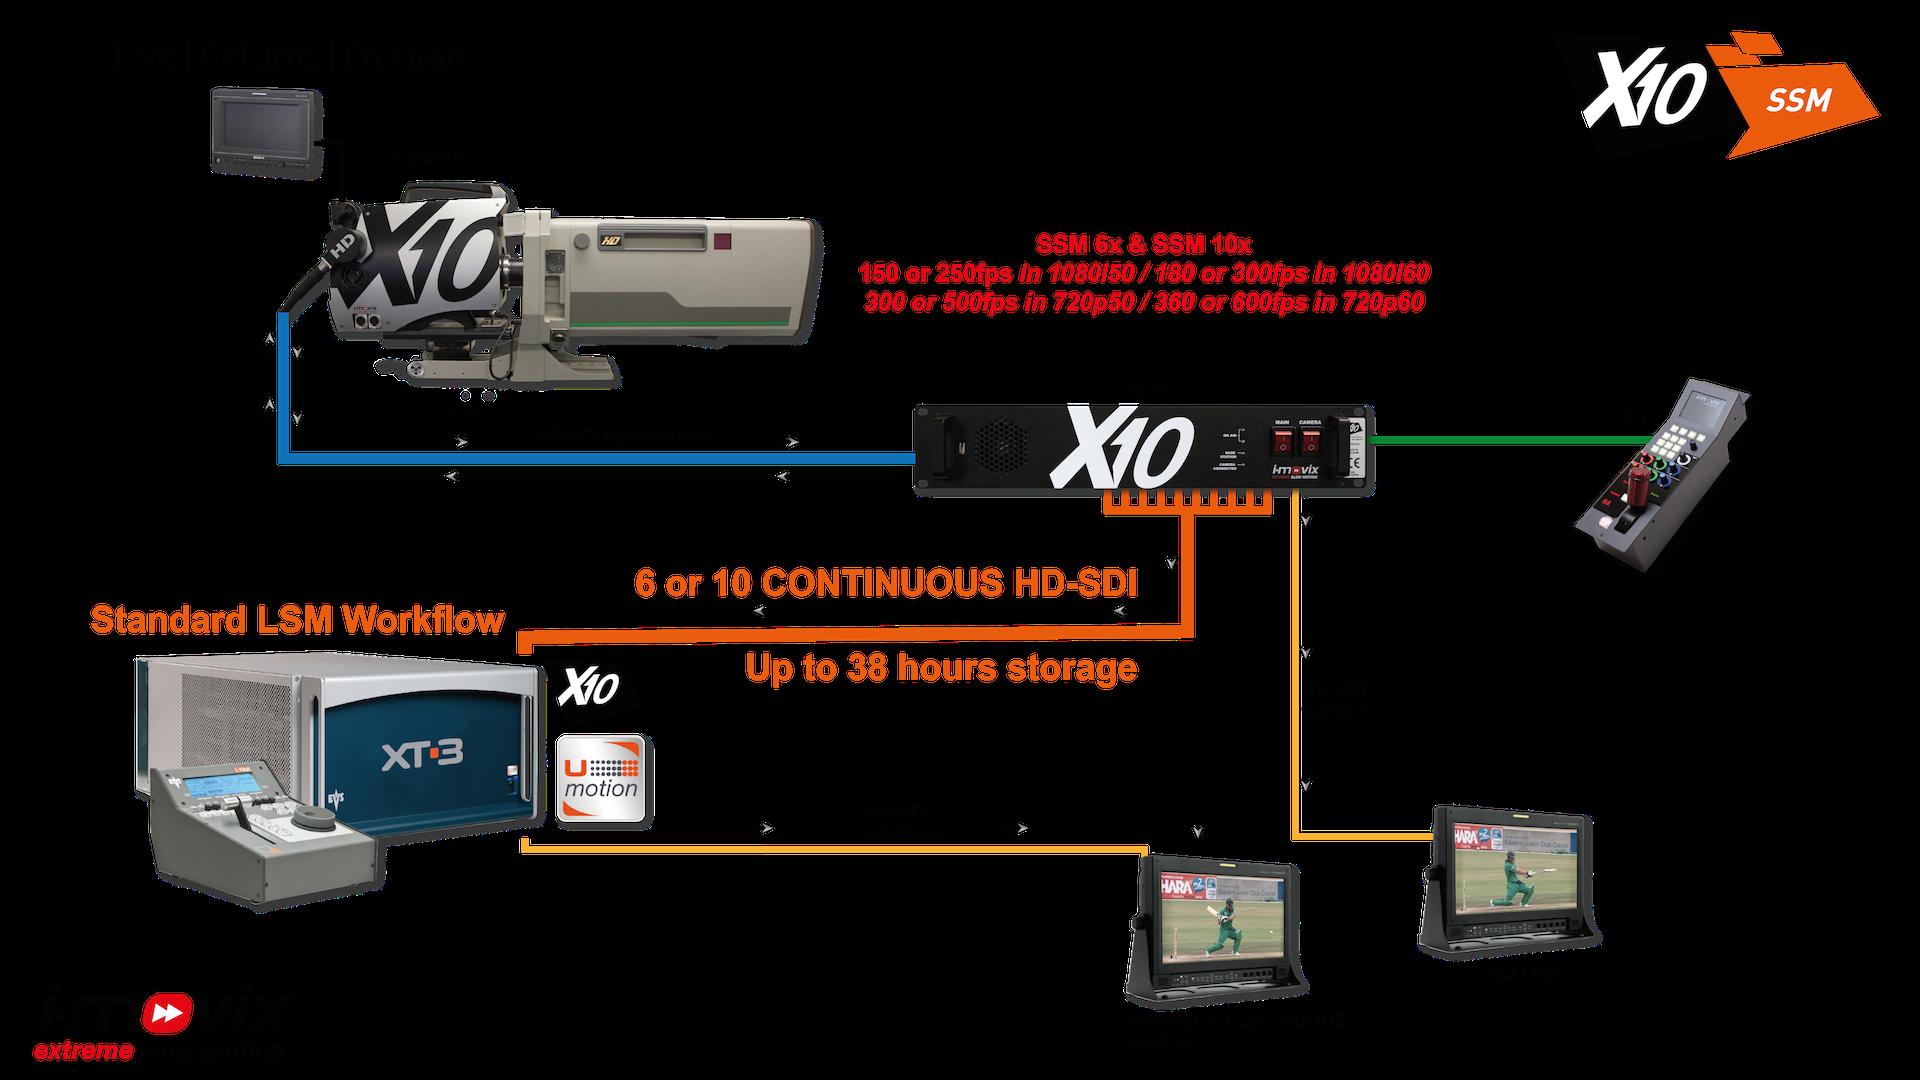 Workflow X10 SSM